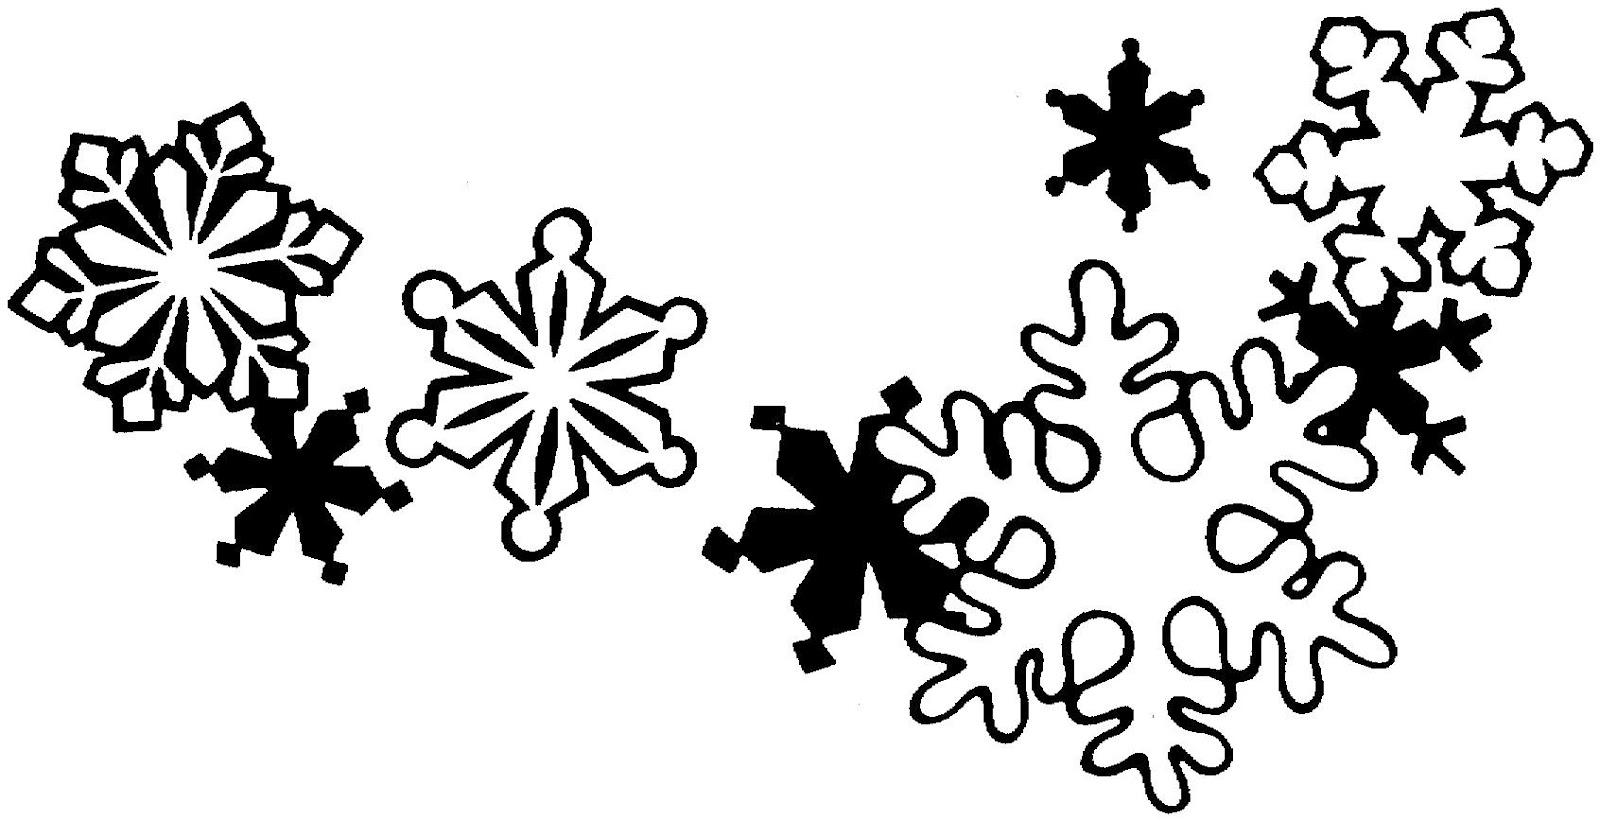 Snowman  black and white snowflake clipart black and white free 3